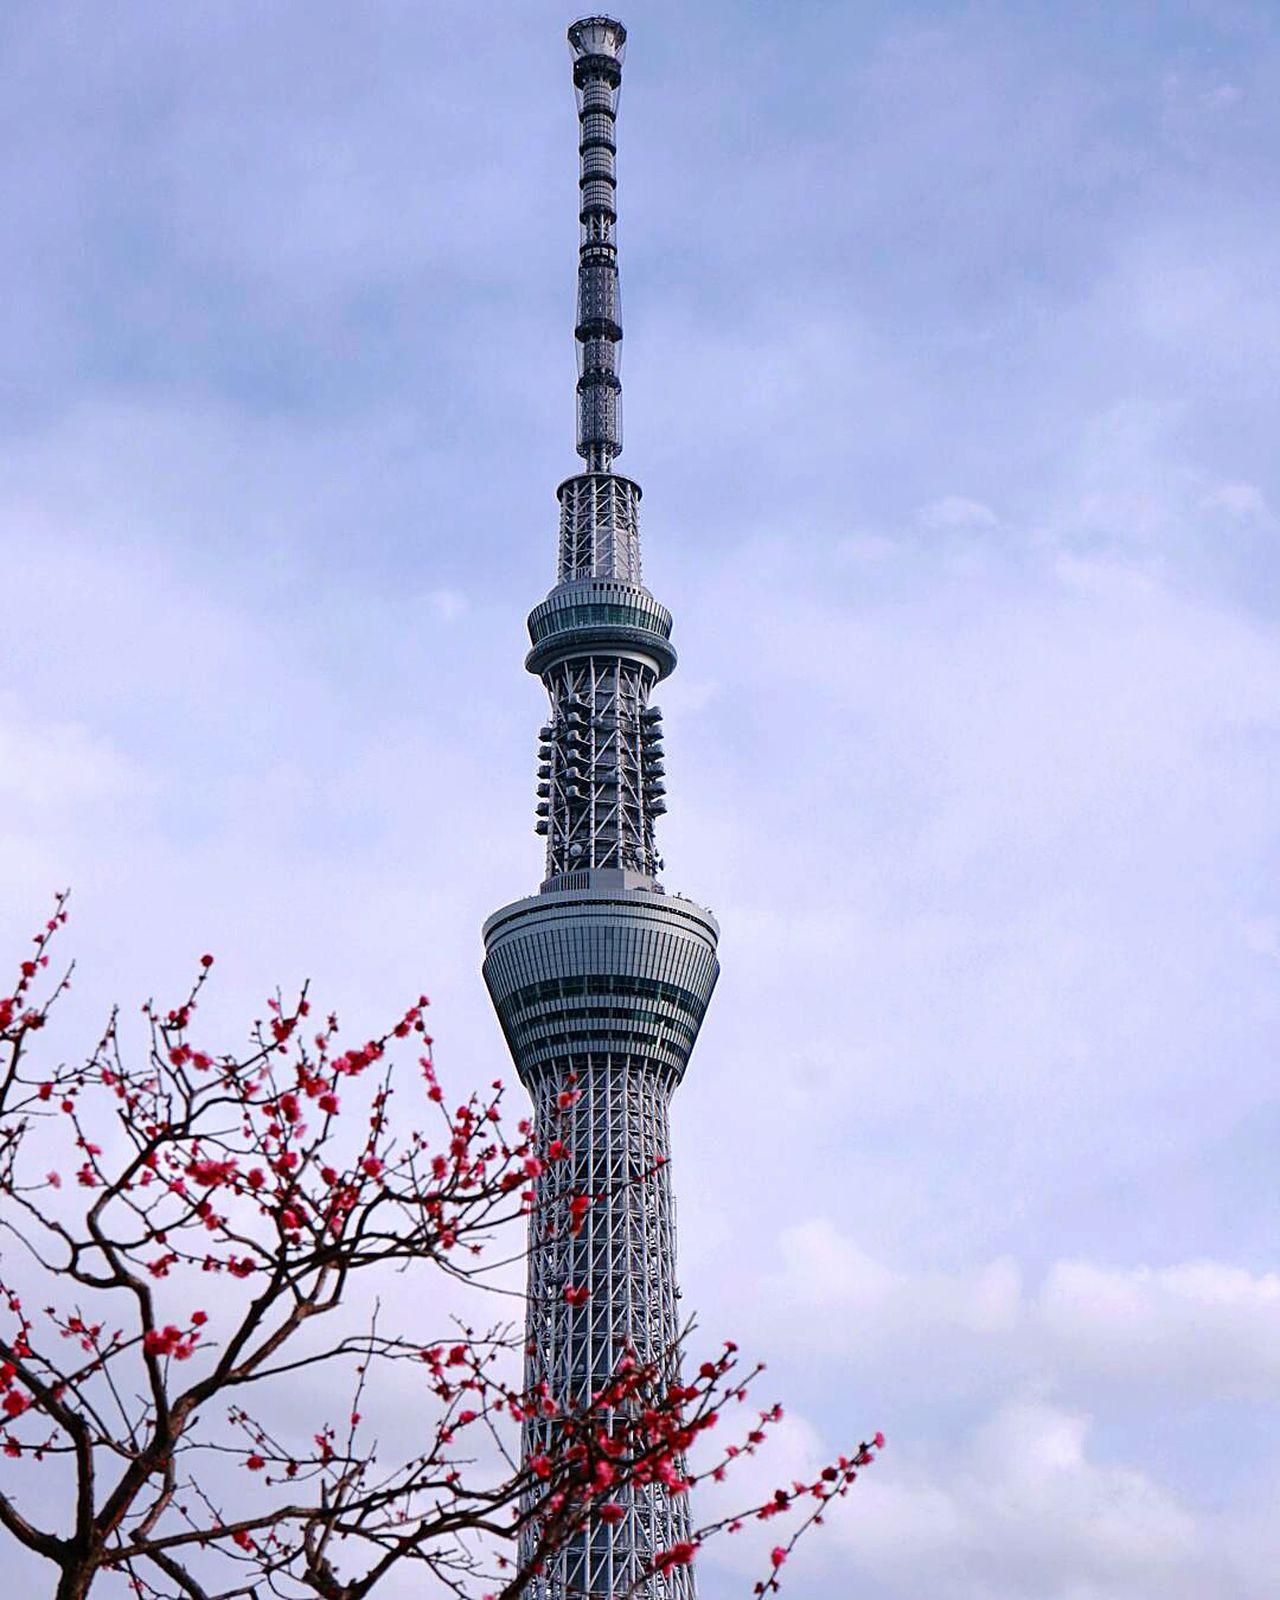 Tower Sky Japan Tokyo Ume Blossom Flower Flowers Blossoms  Tokyoskytree Skytree Sumidapark Tokyo,Japan